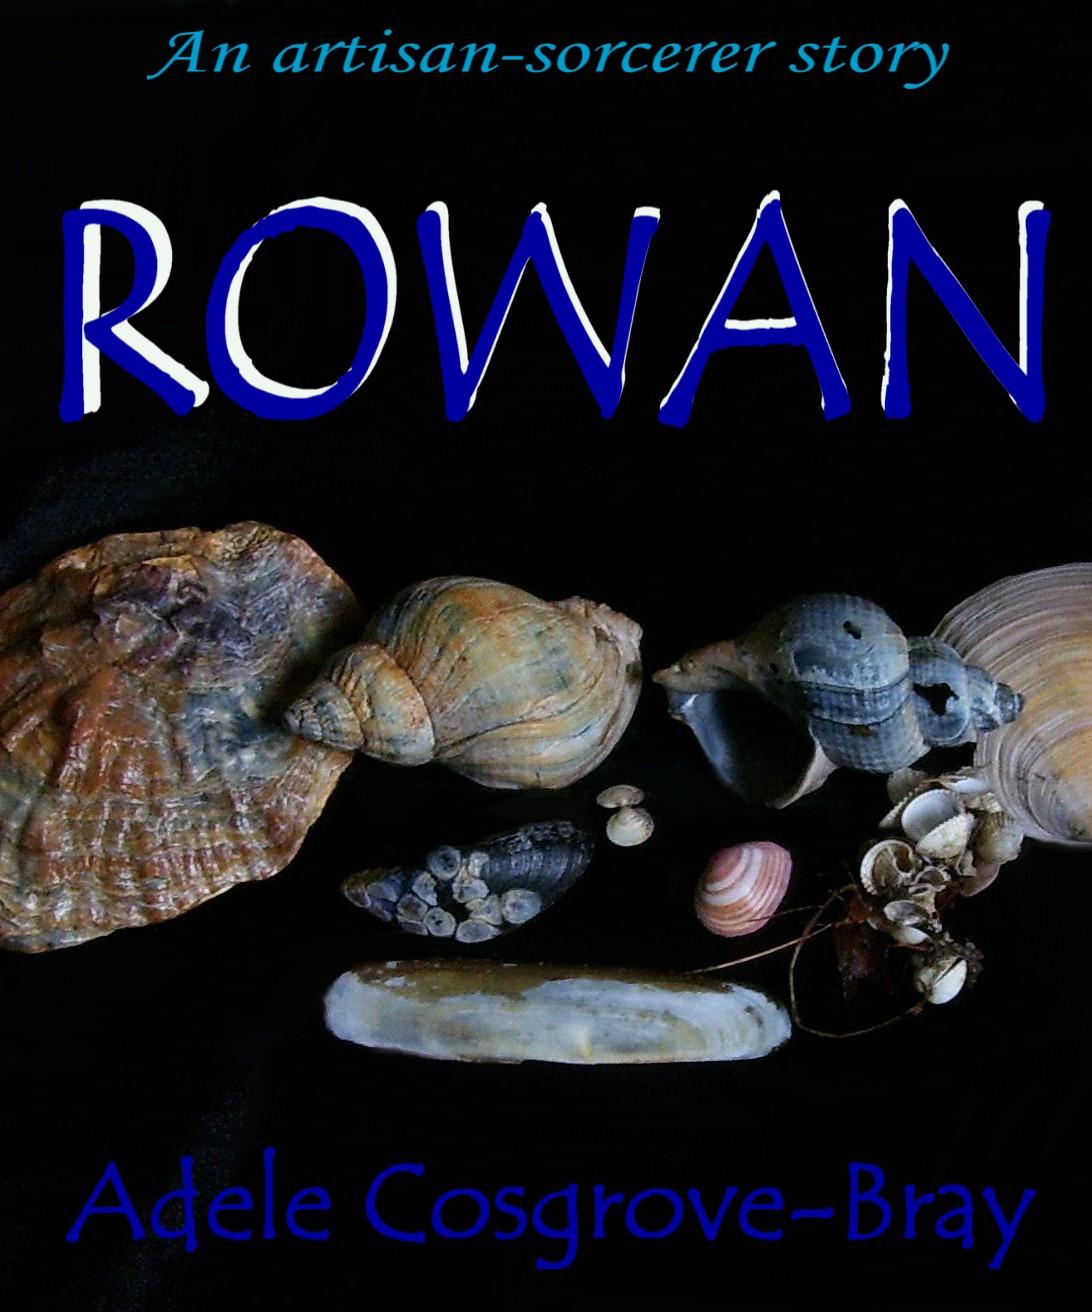 Rowan by Adele Cosgrove-Bray